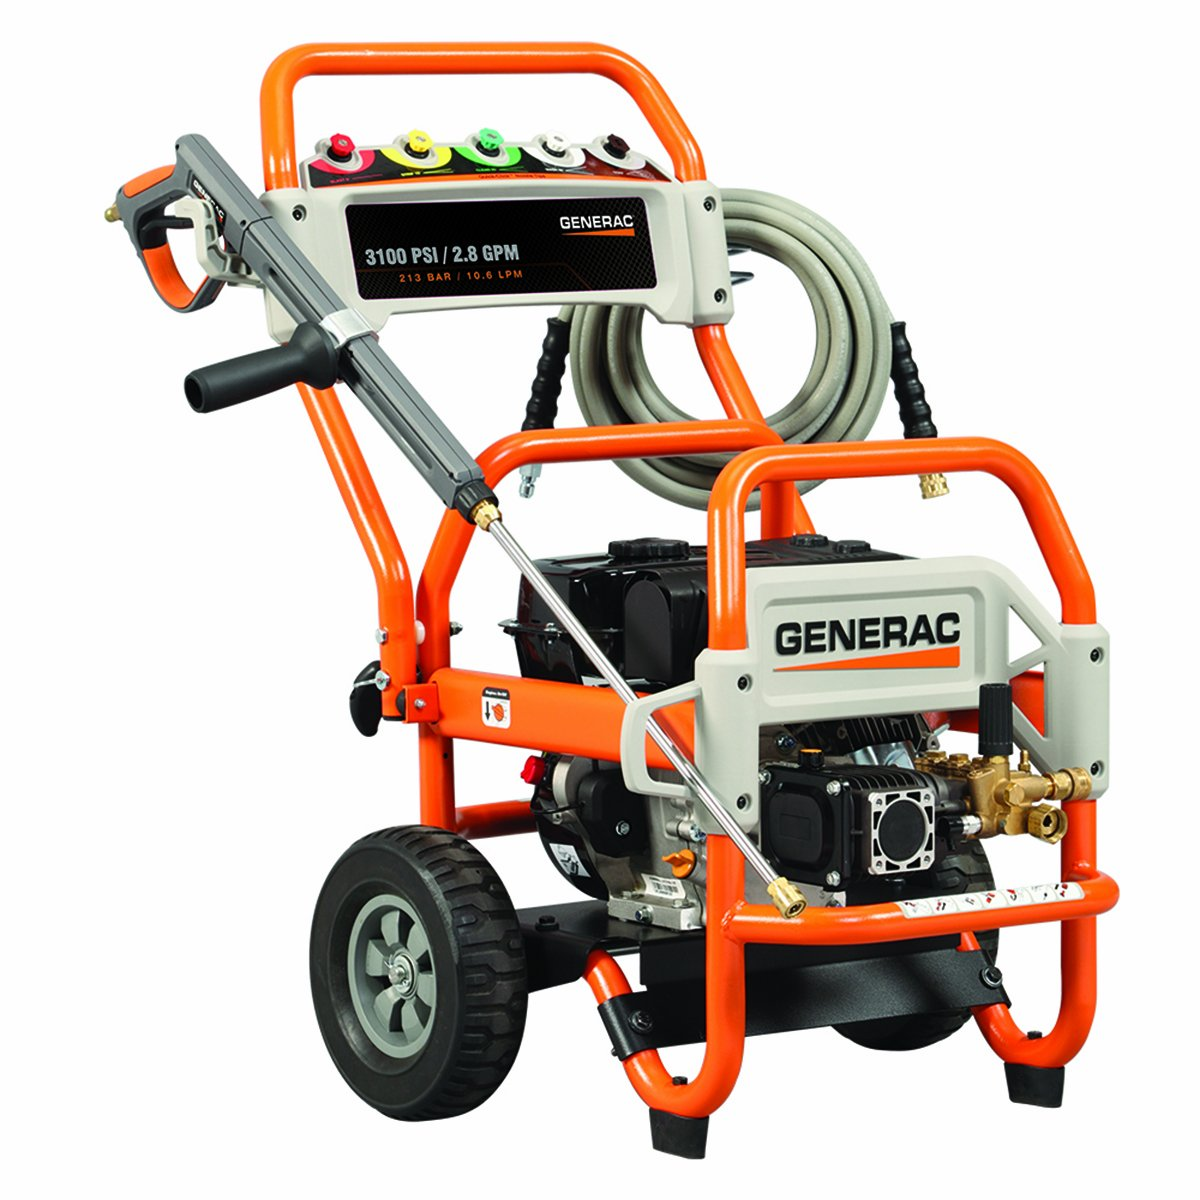 Generac 5993 professional pressure washer